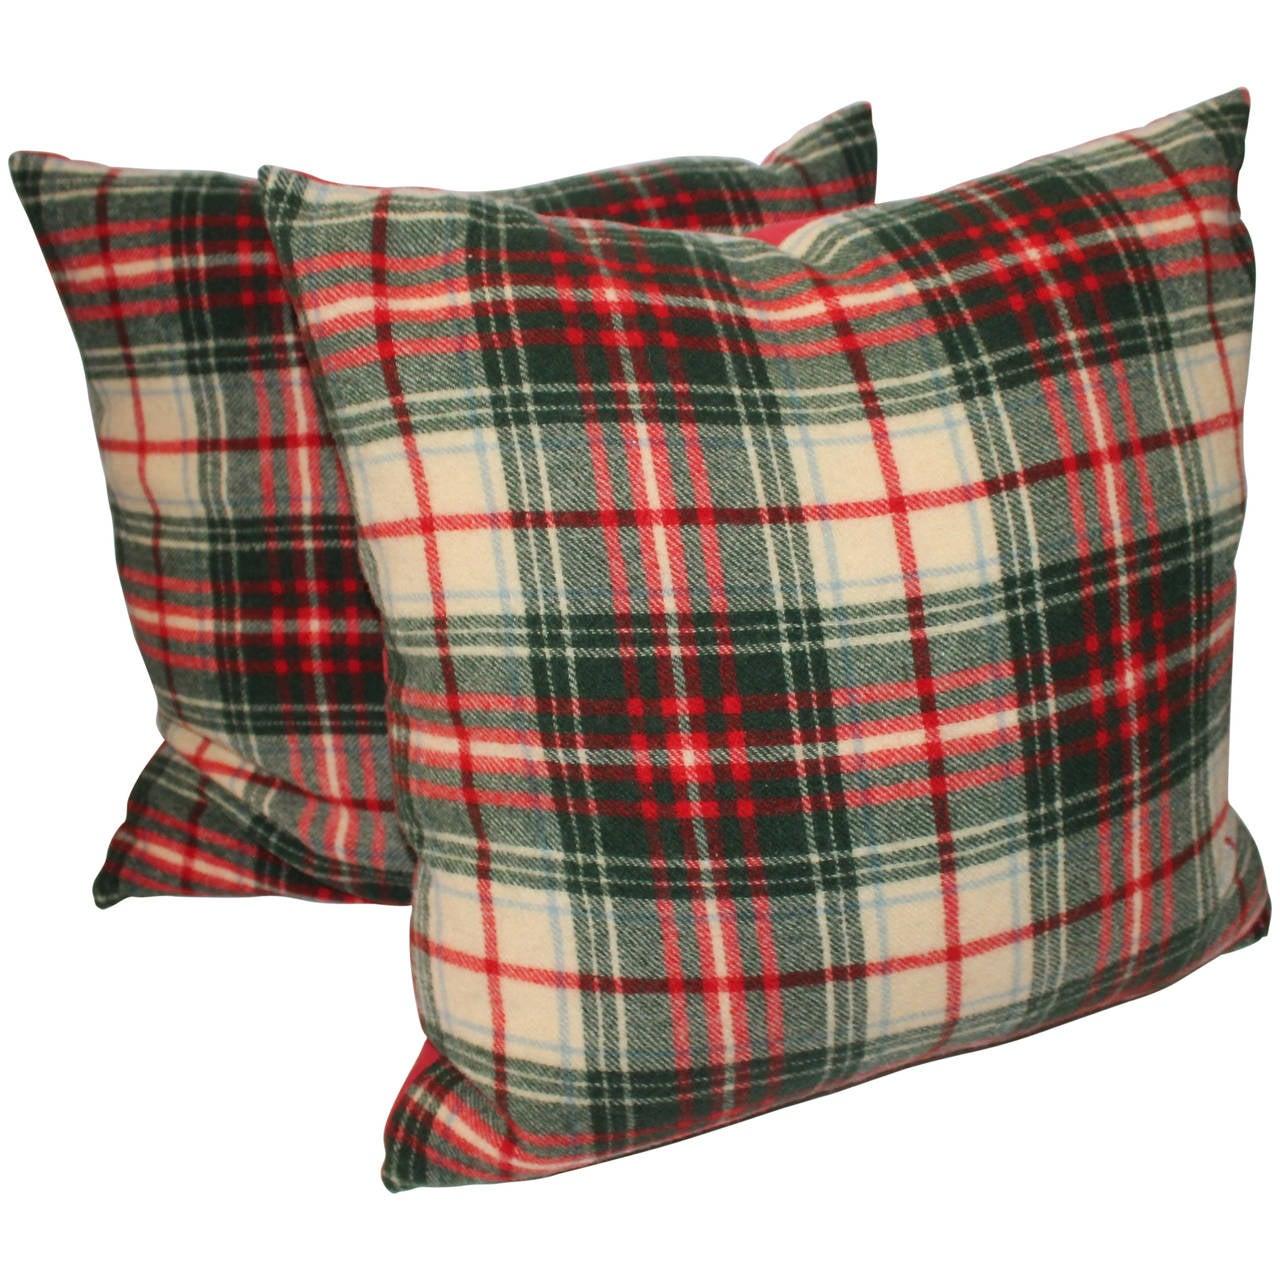 Pair of Wool Plaid Pillows